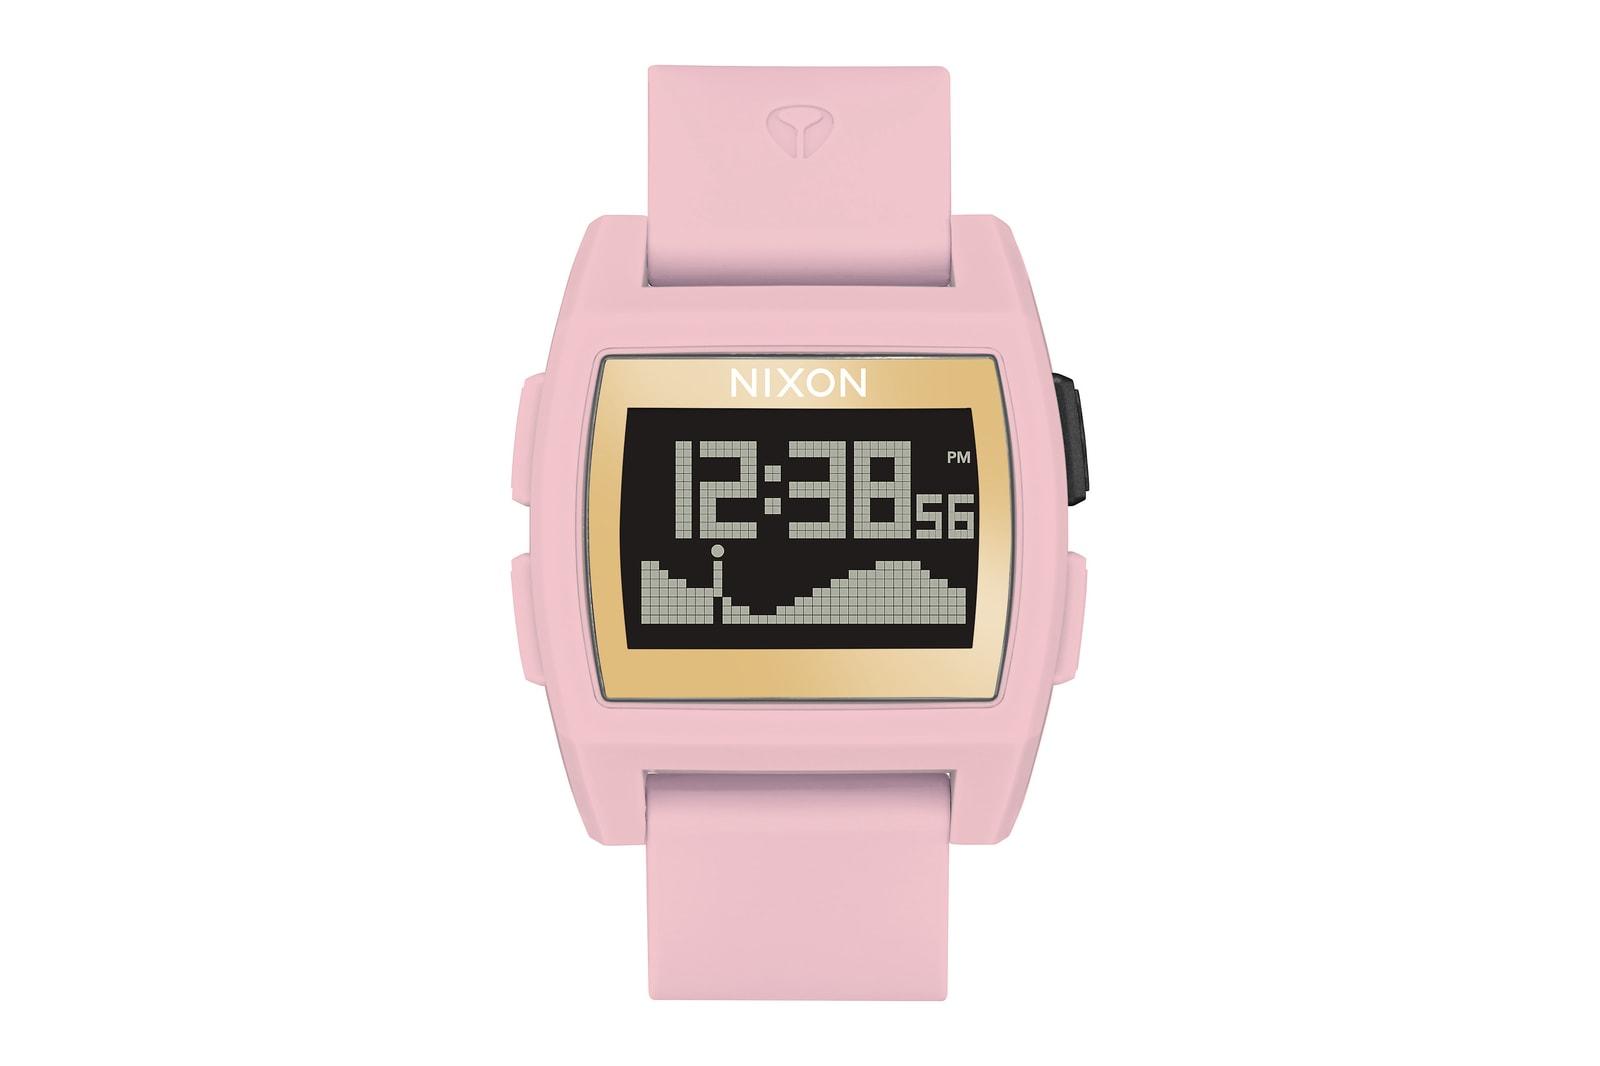 Nixon Leila Hurst Watch Series